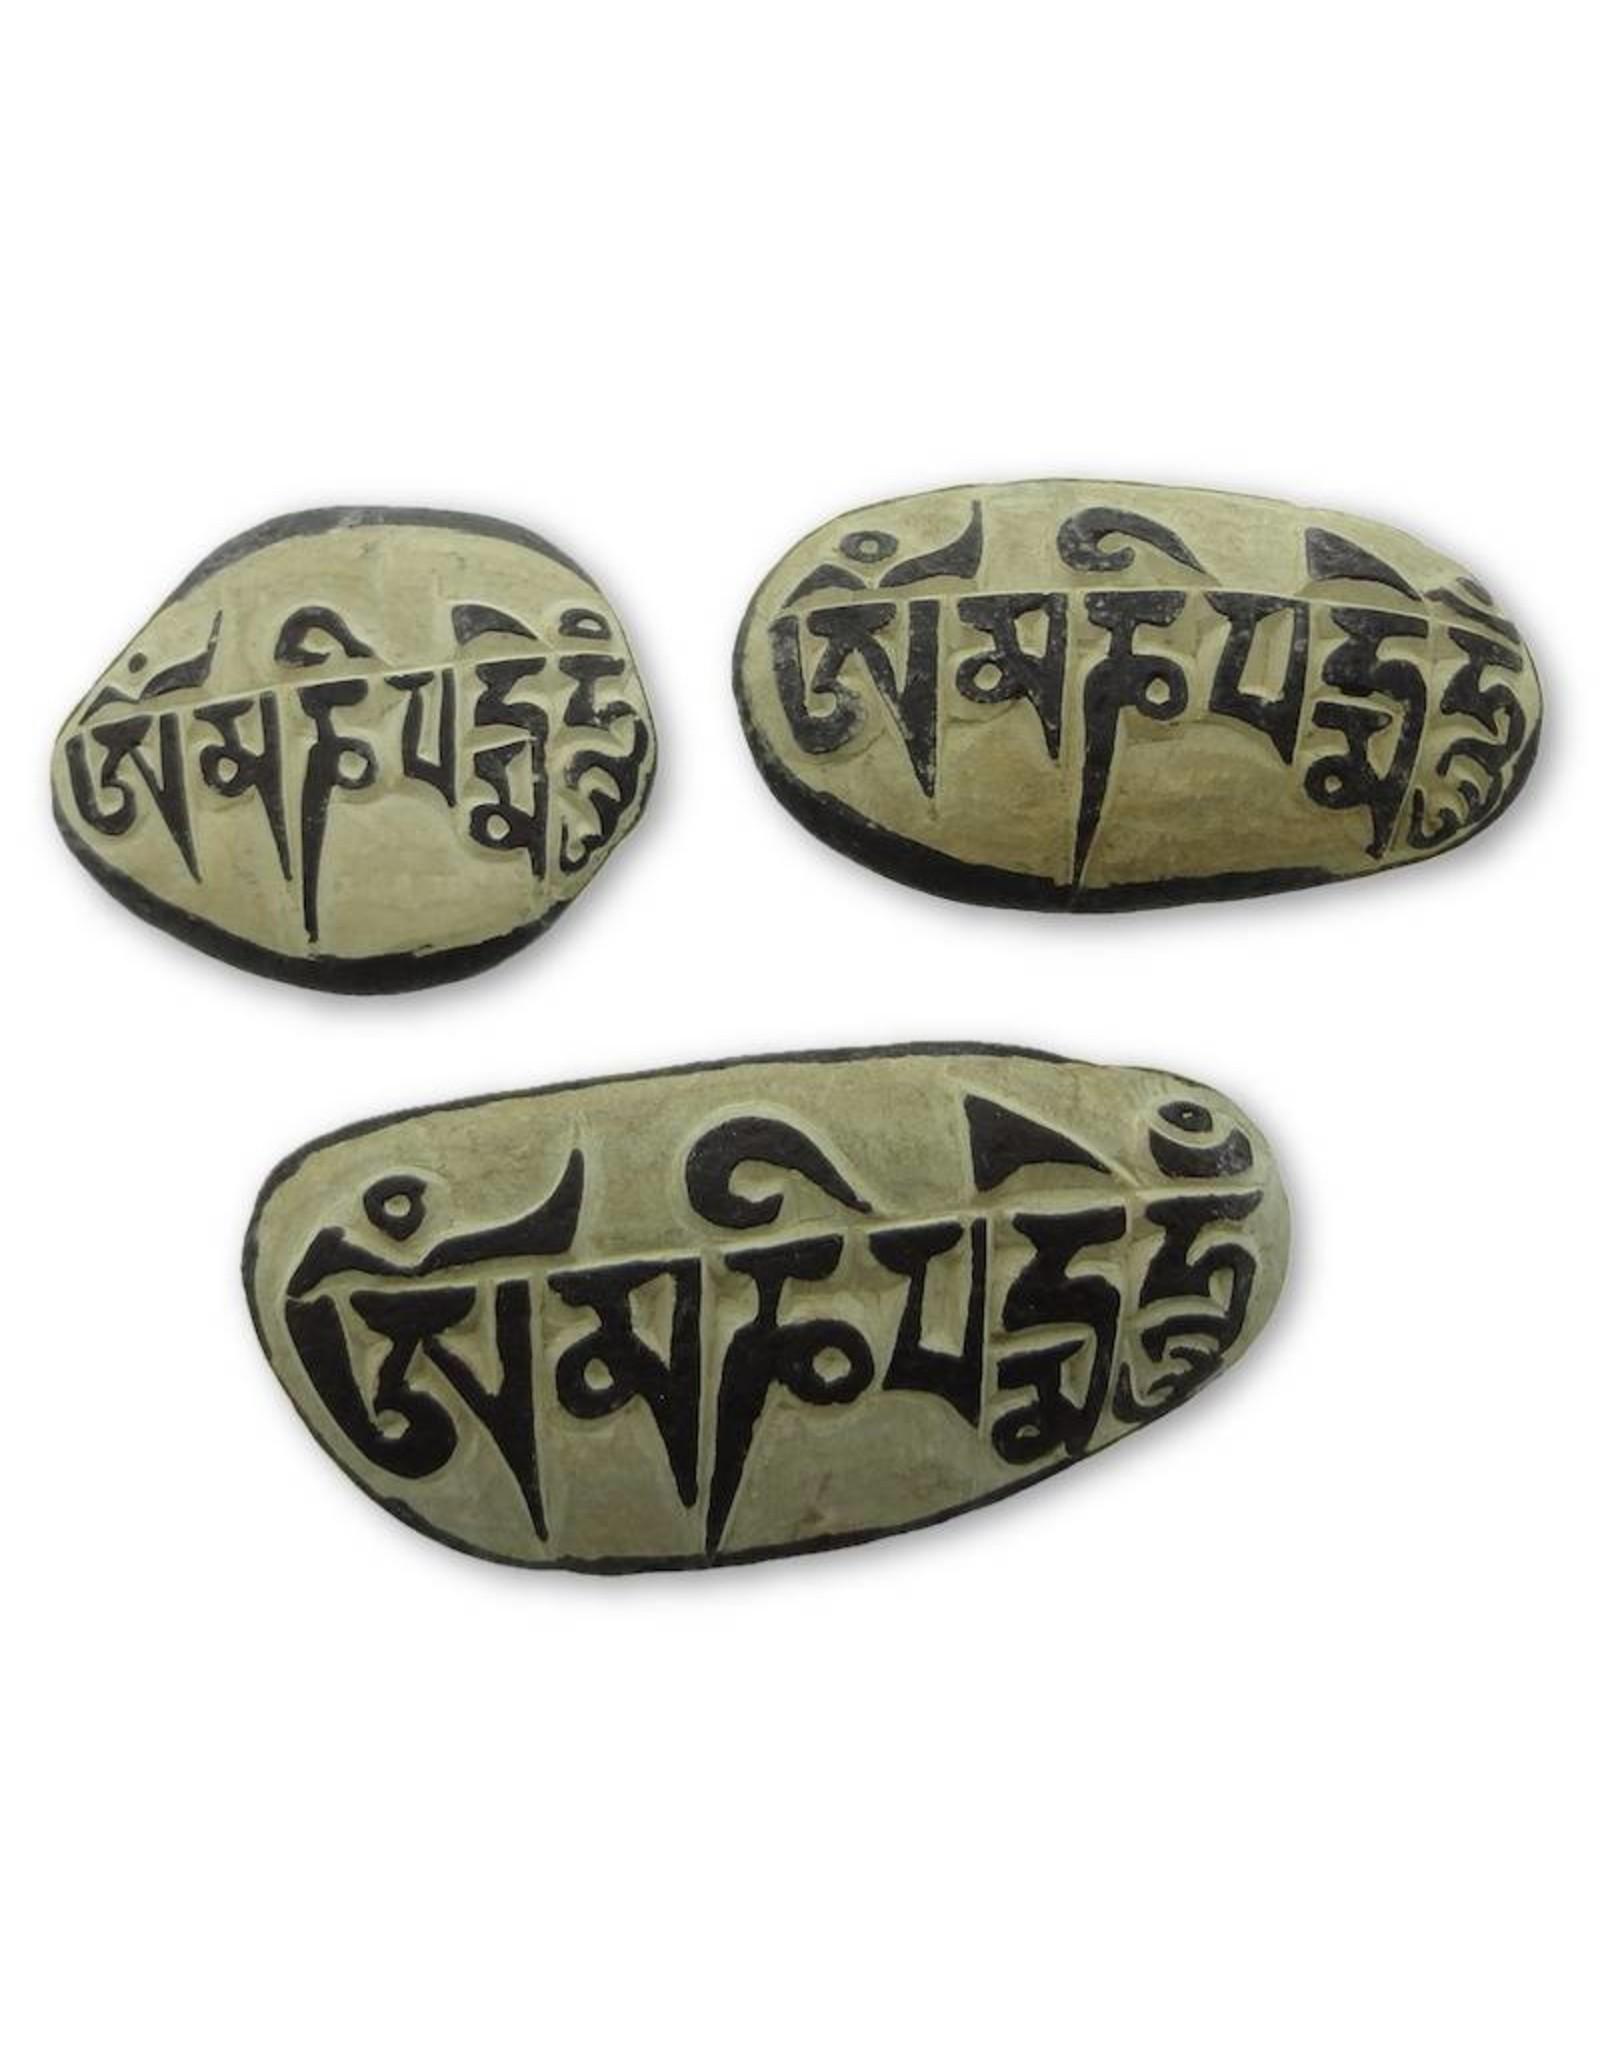 Tibetan luck stone